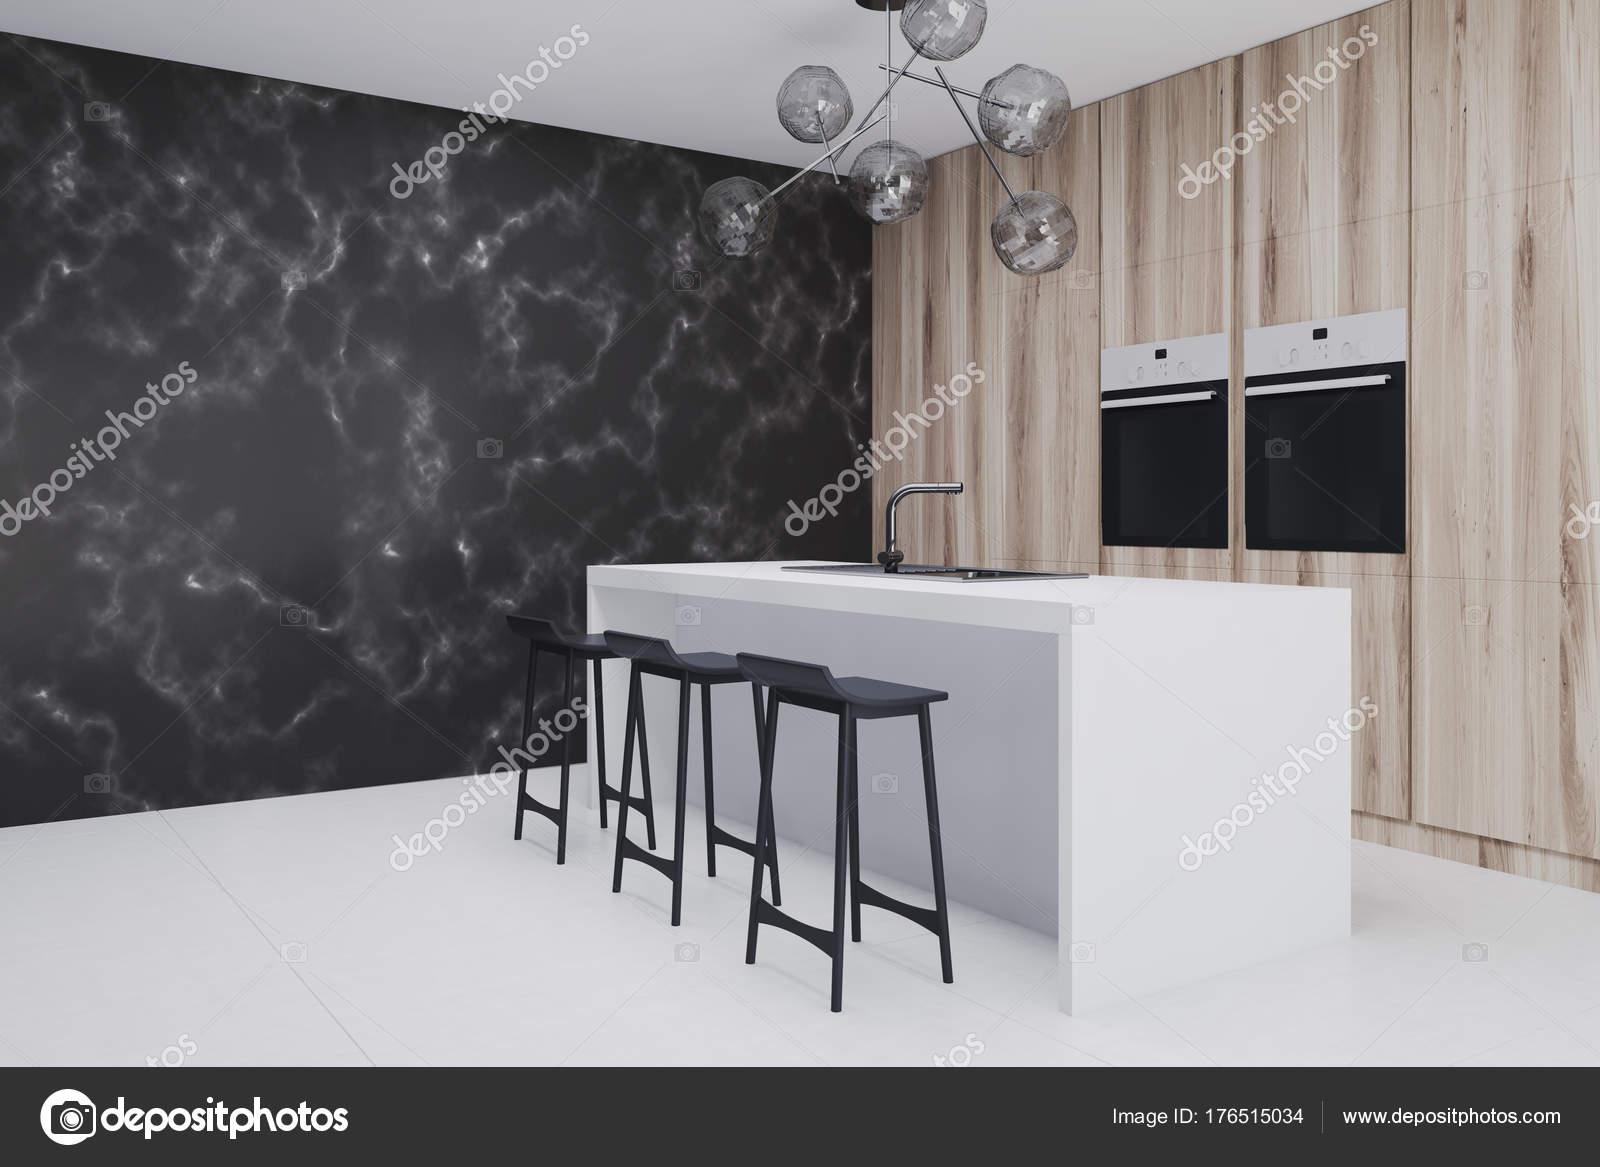 Marmer Zwart Keuken : Houten keuken met bar kant zwart marmeren closeup u2014 stockfoto